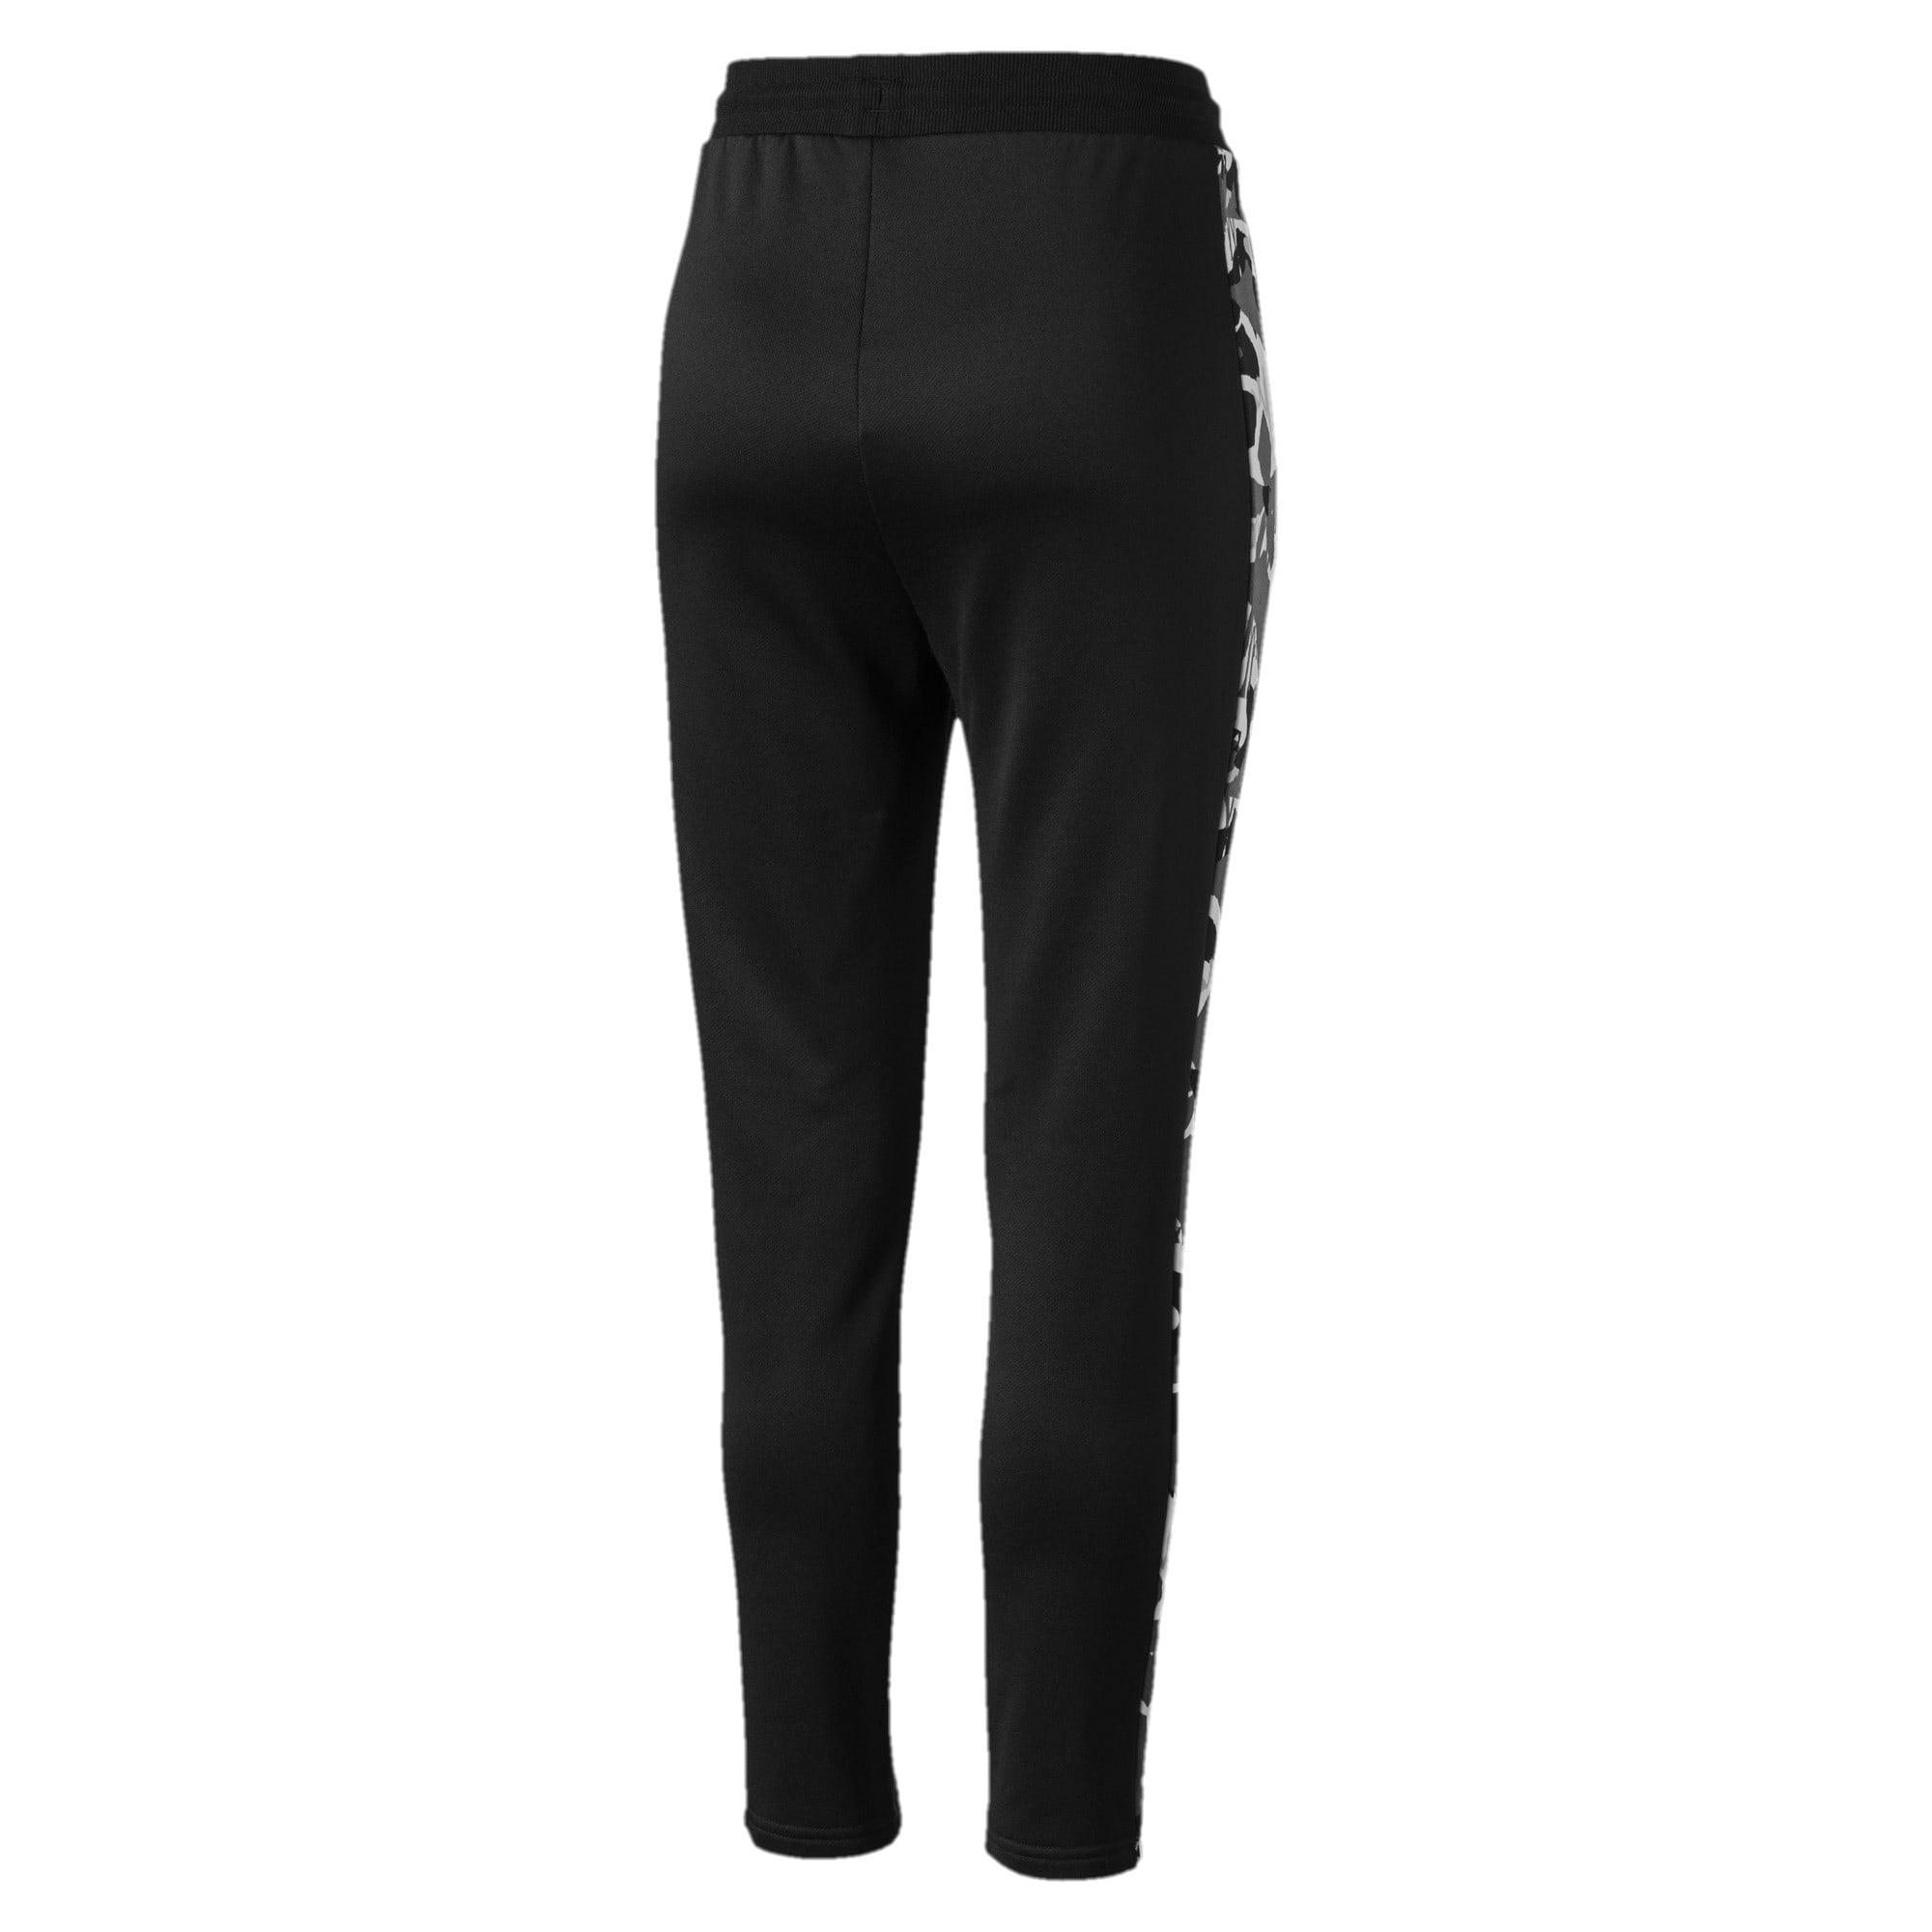 Miniatura 3 de Pantalones deportivos ClassicsAOP T7 para mujer, Puma Black, mediano